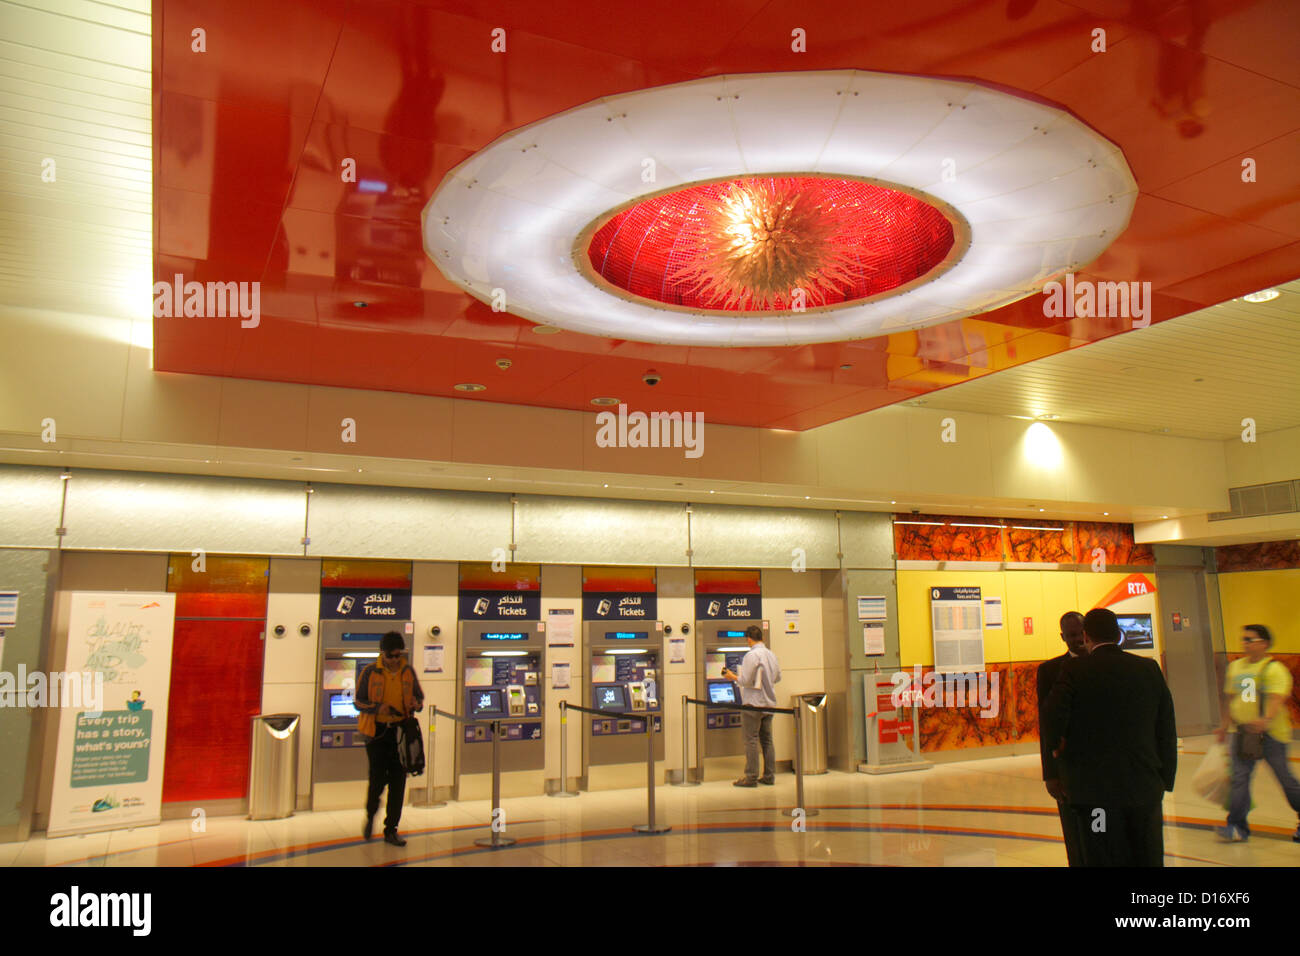 Uae exchange in union metro station 312 : Securecoin forum 90